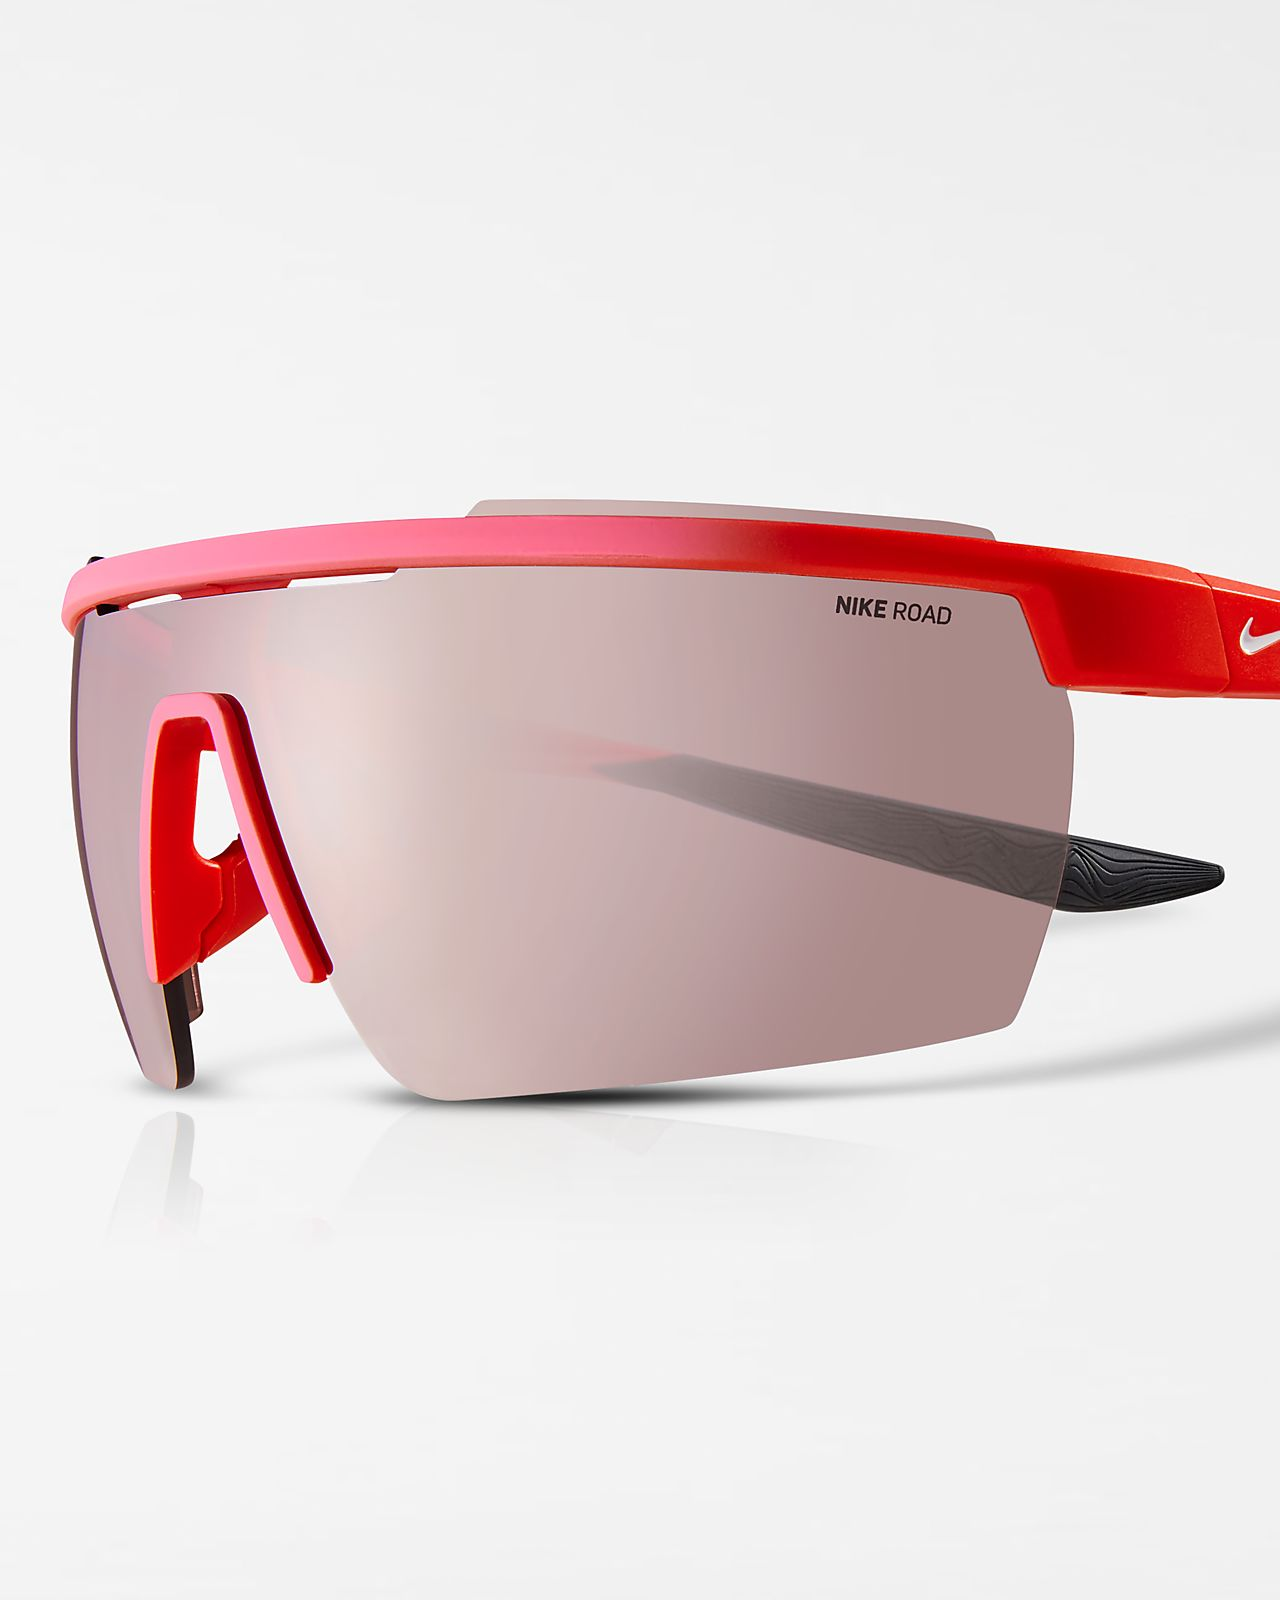 Nike Windshield Elite X KFB Road Tint Sunglasses